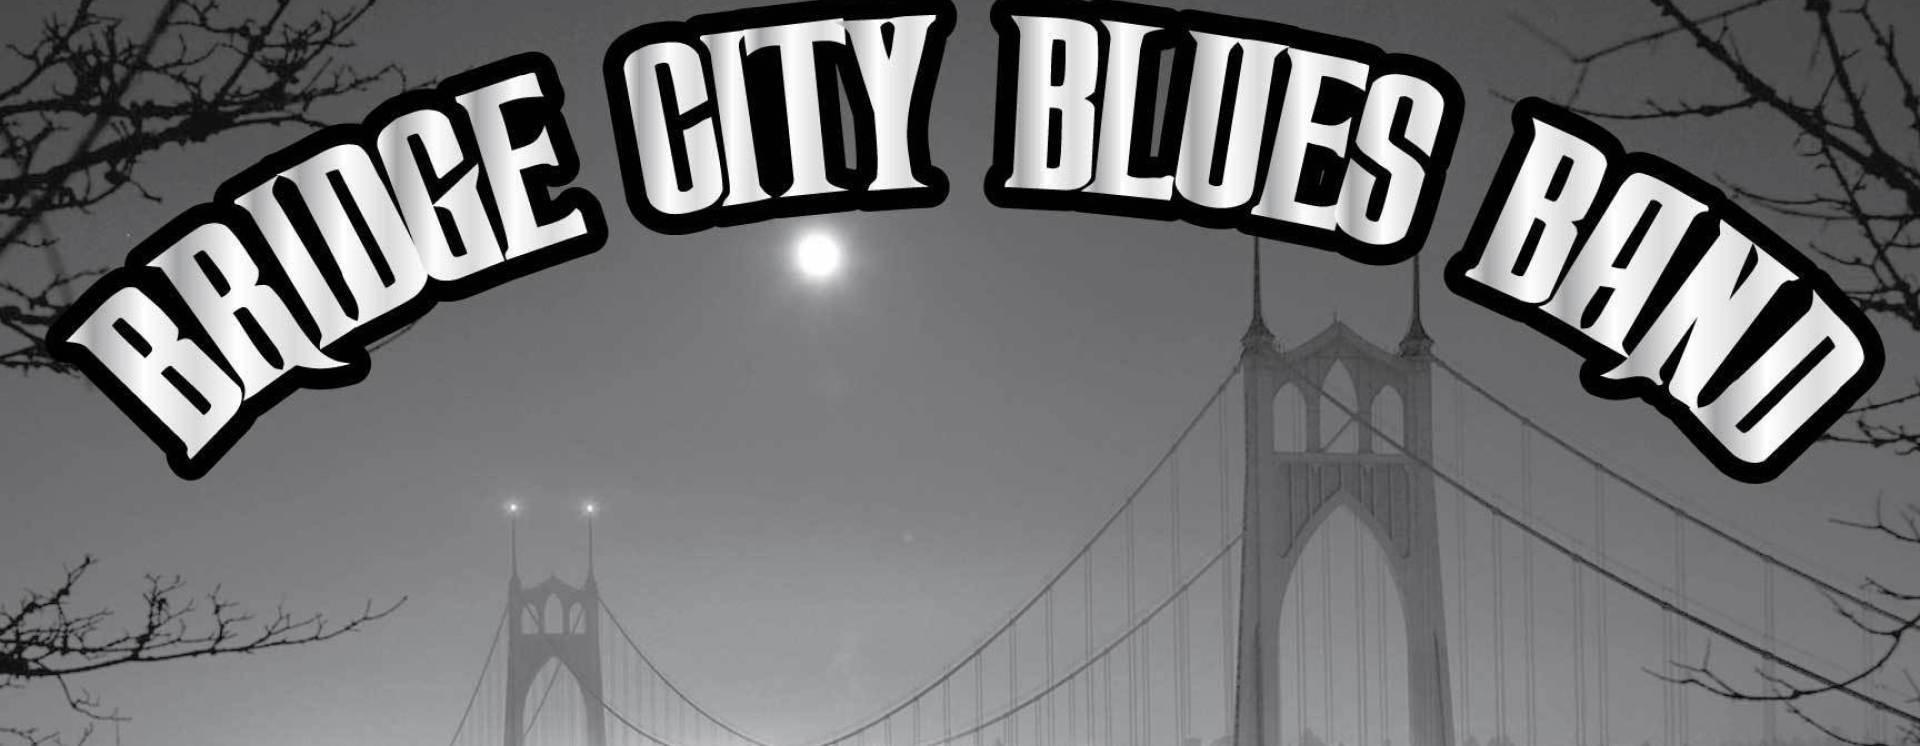 1416591483 blues band image copy